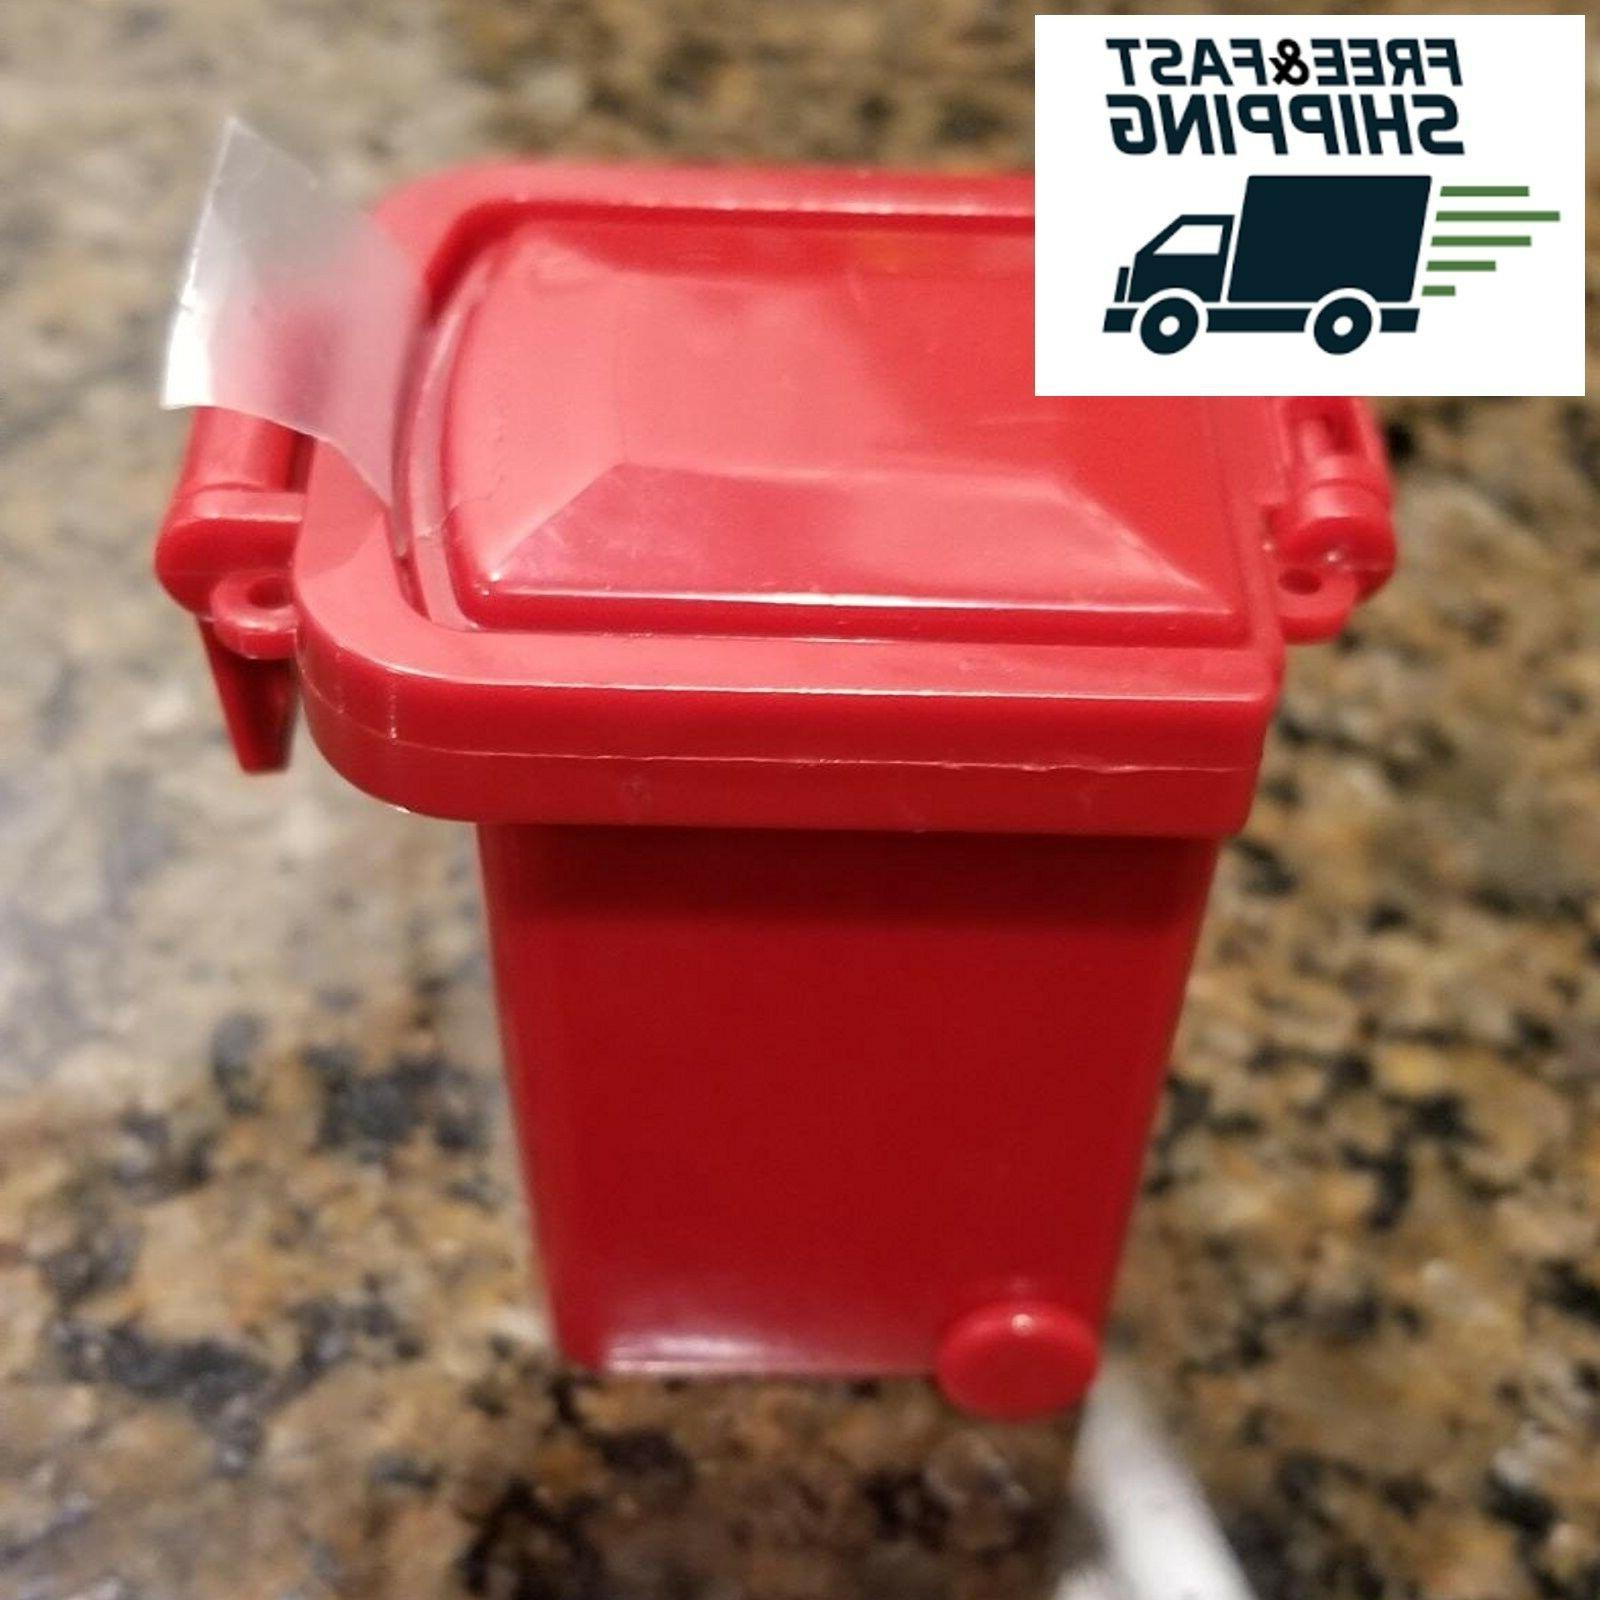 Original Vehicle Bin Trash Can Toy Toddlers